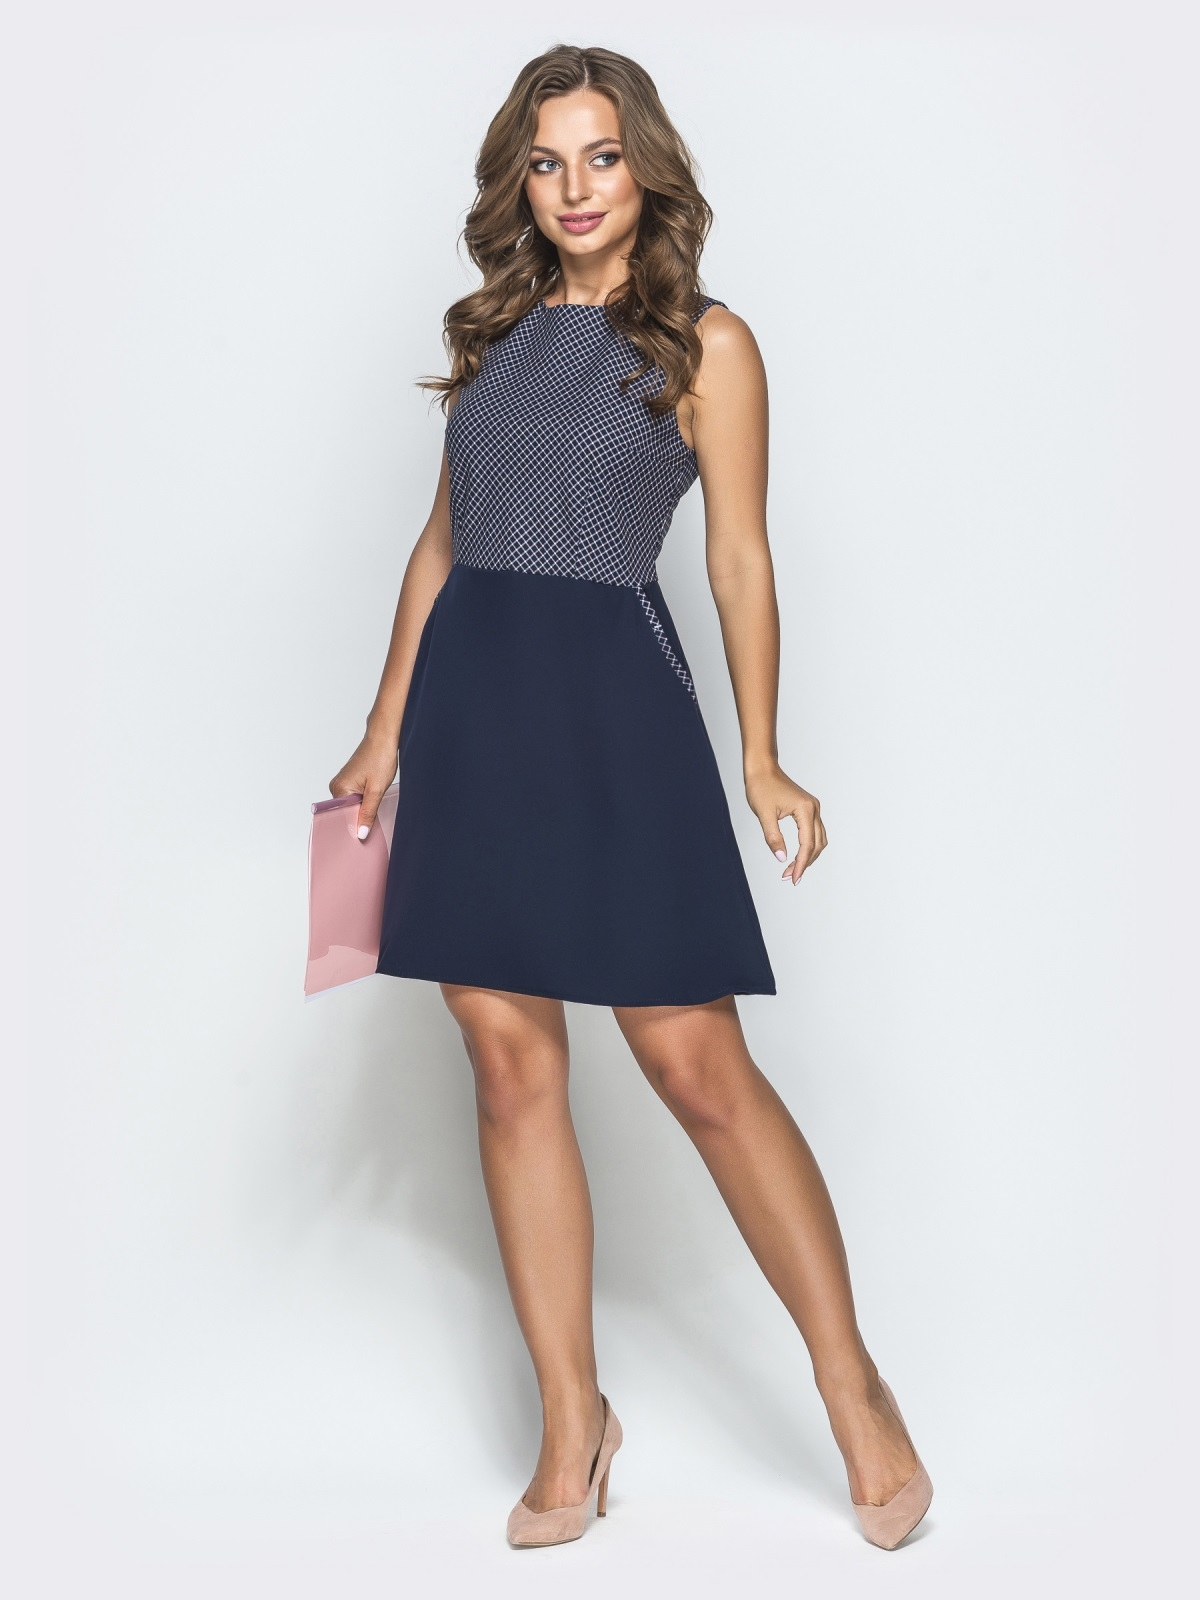 Тёмно-синее платье в белую клетку с юбкой-трапецией 39789, фото 1